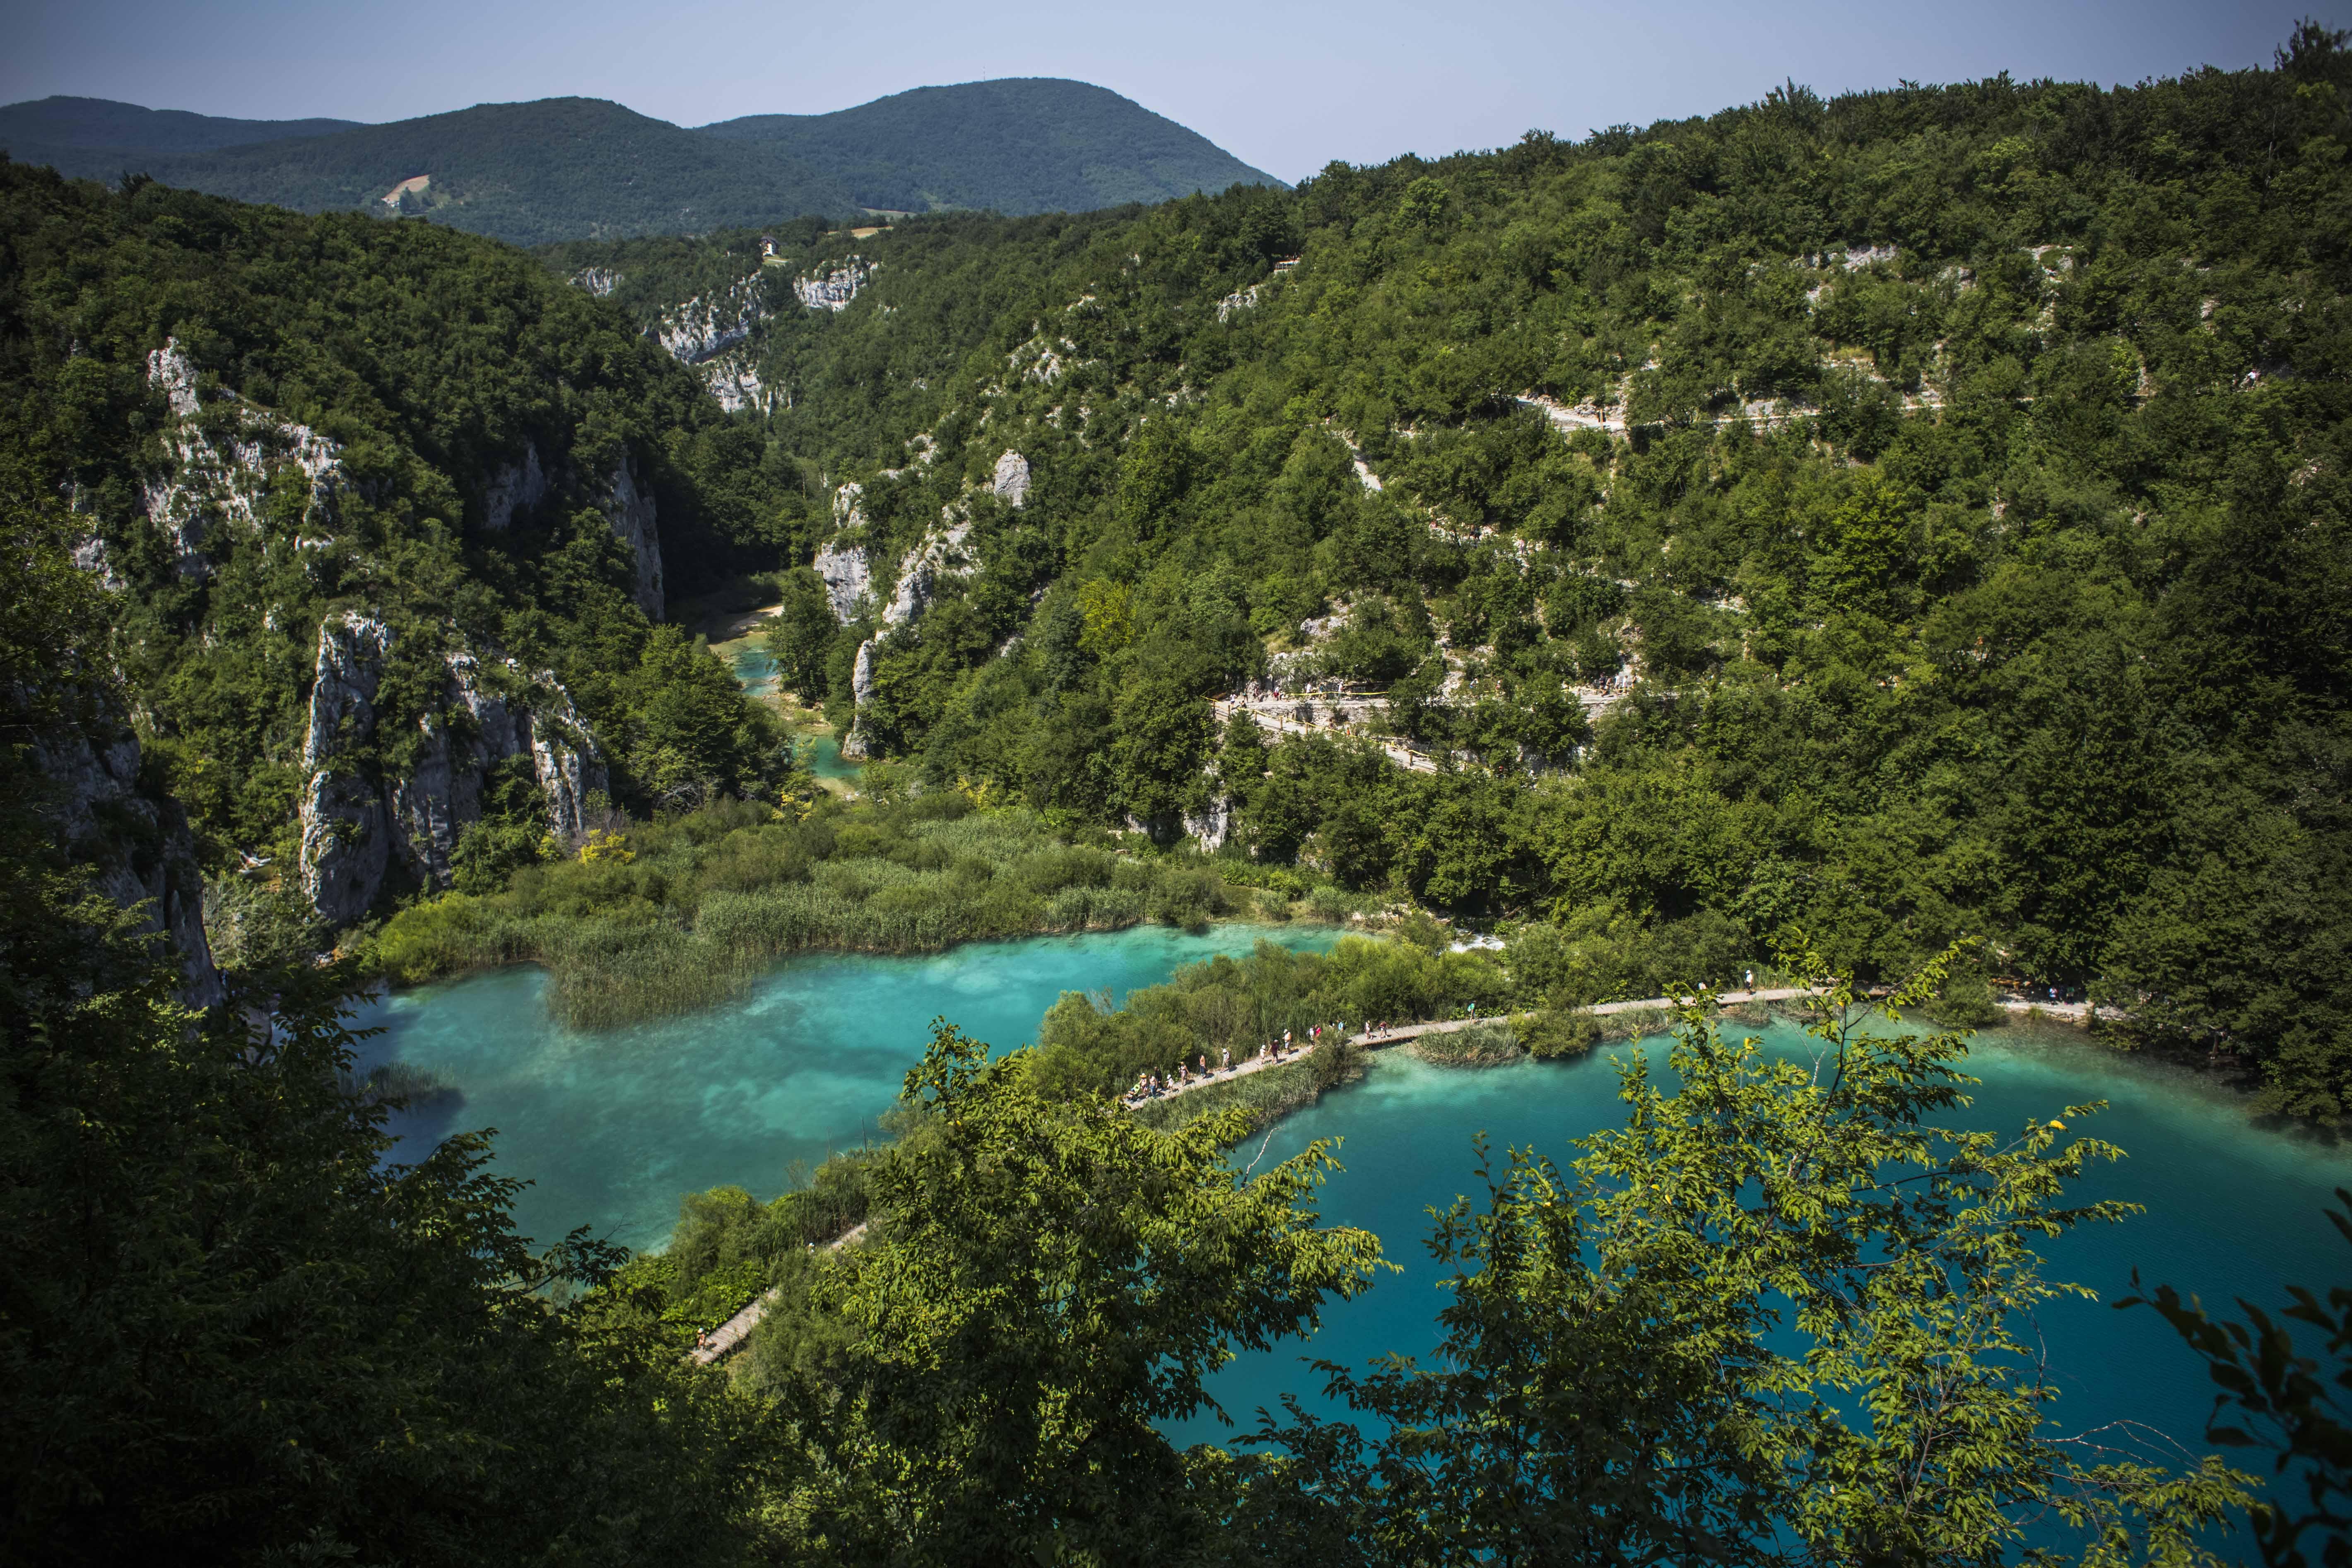 Travel Destination: Plitvice Lakes, Croatia